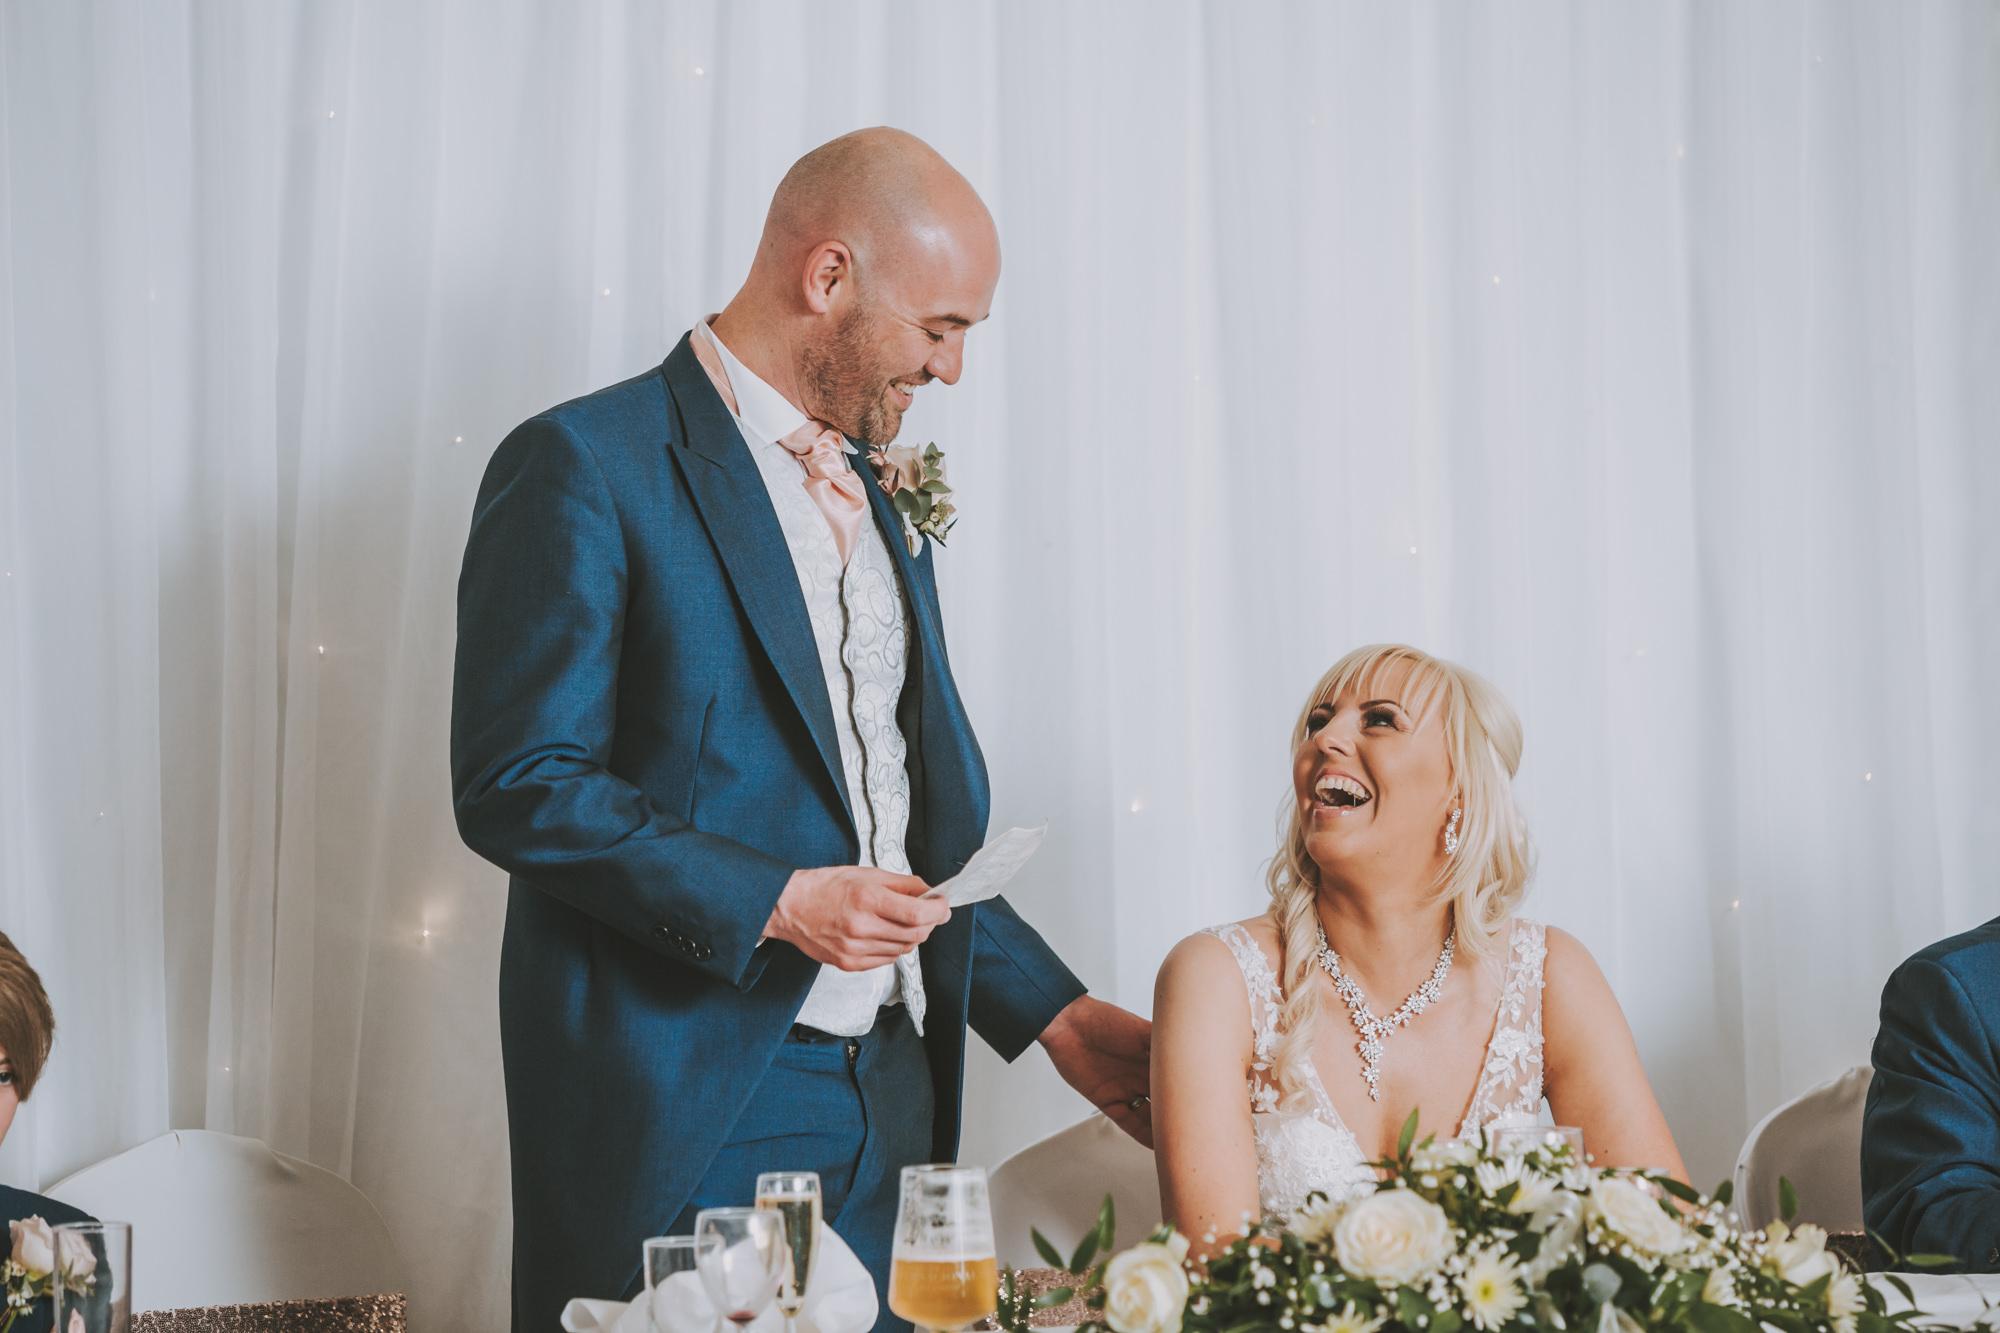 hellaby hall wedding photographers in rotherham, yorkshire-64.jpg